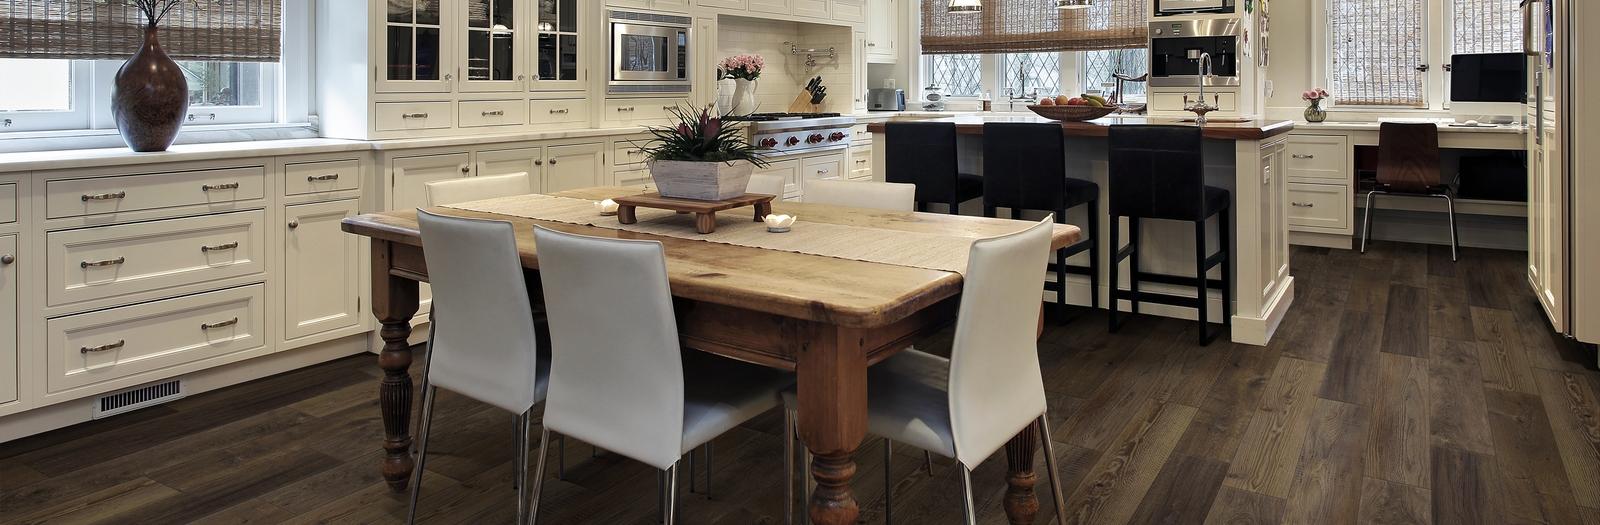 Elite Kitchen Design Aurora Il